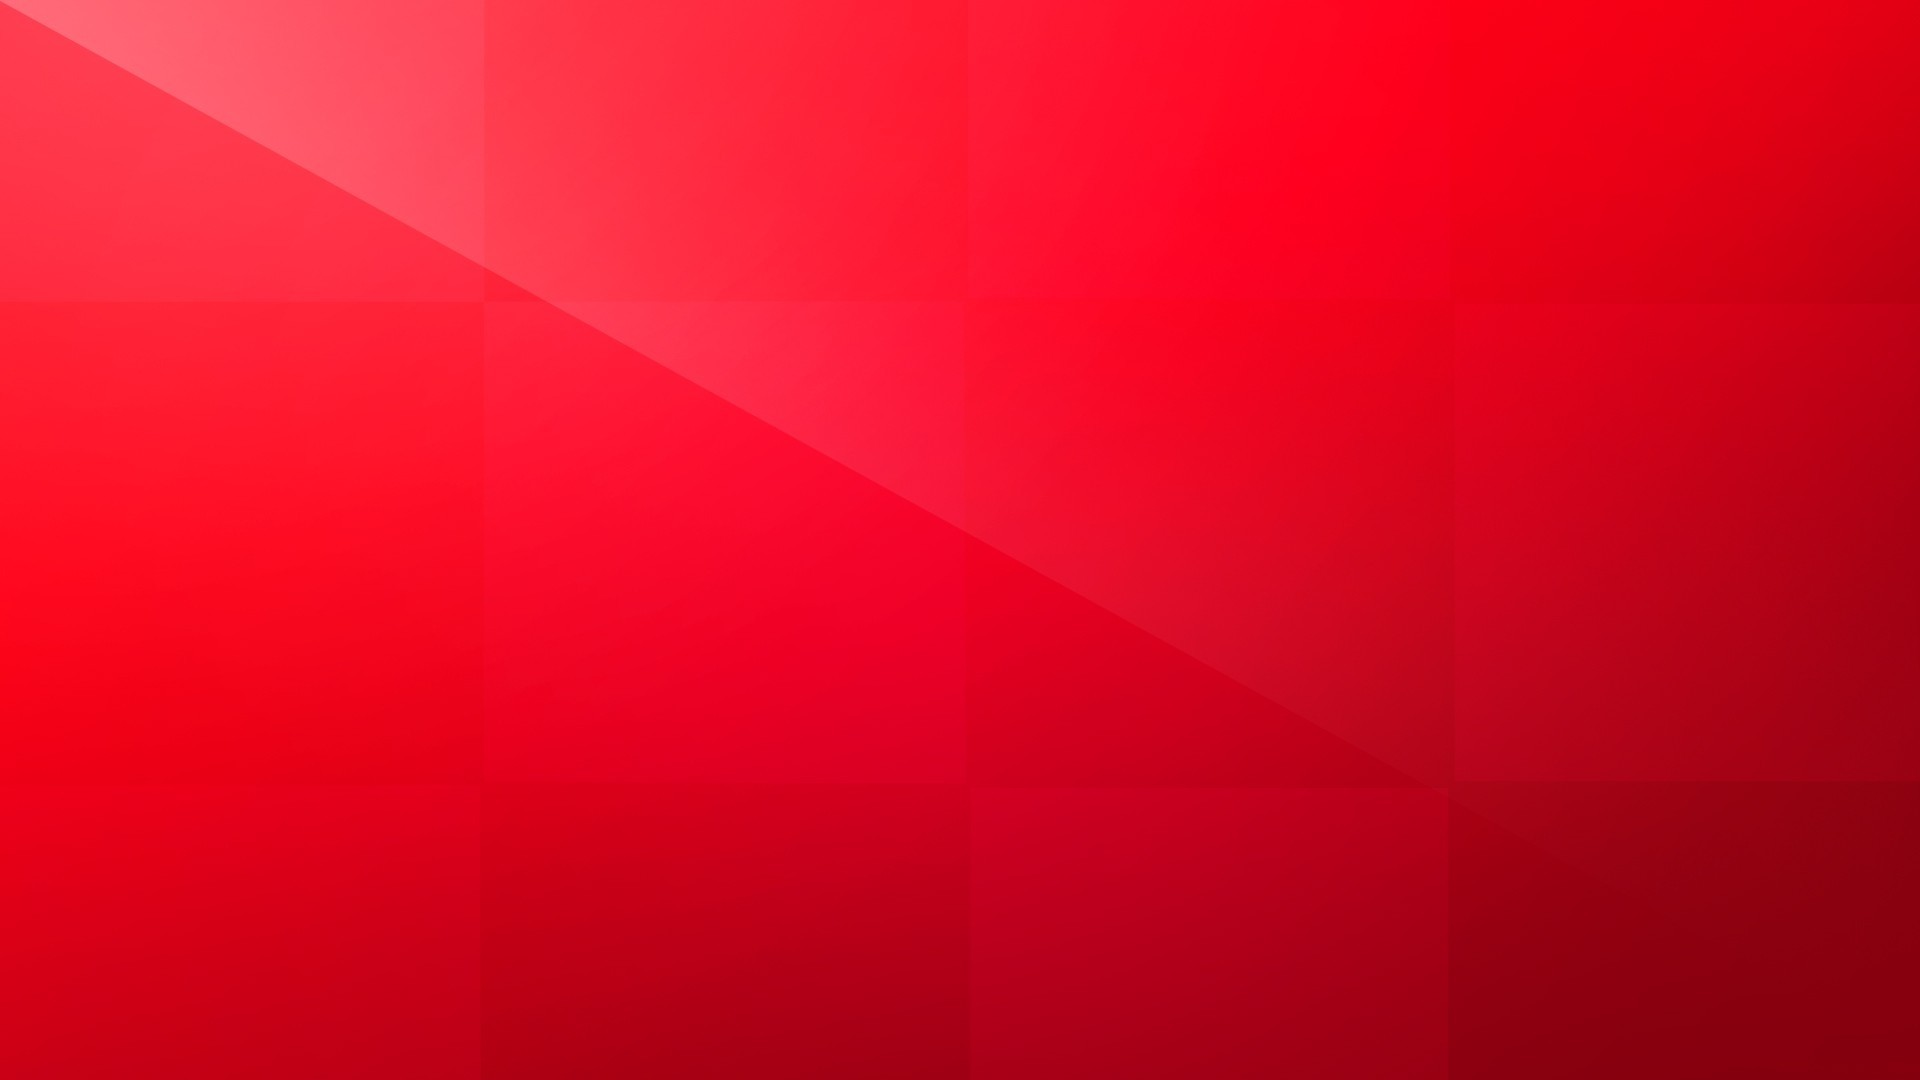 background, light, solid; background, solid, line